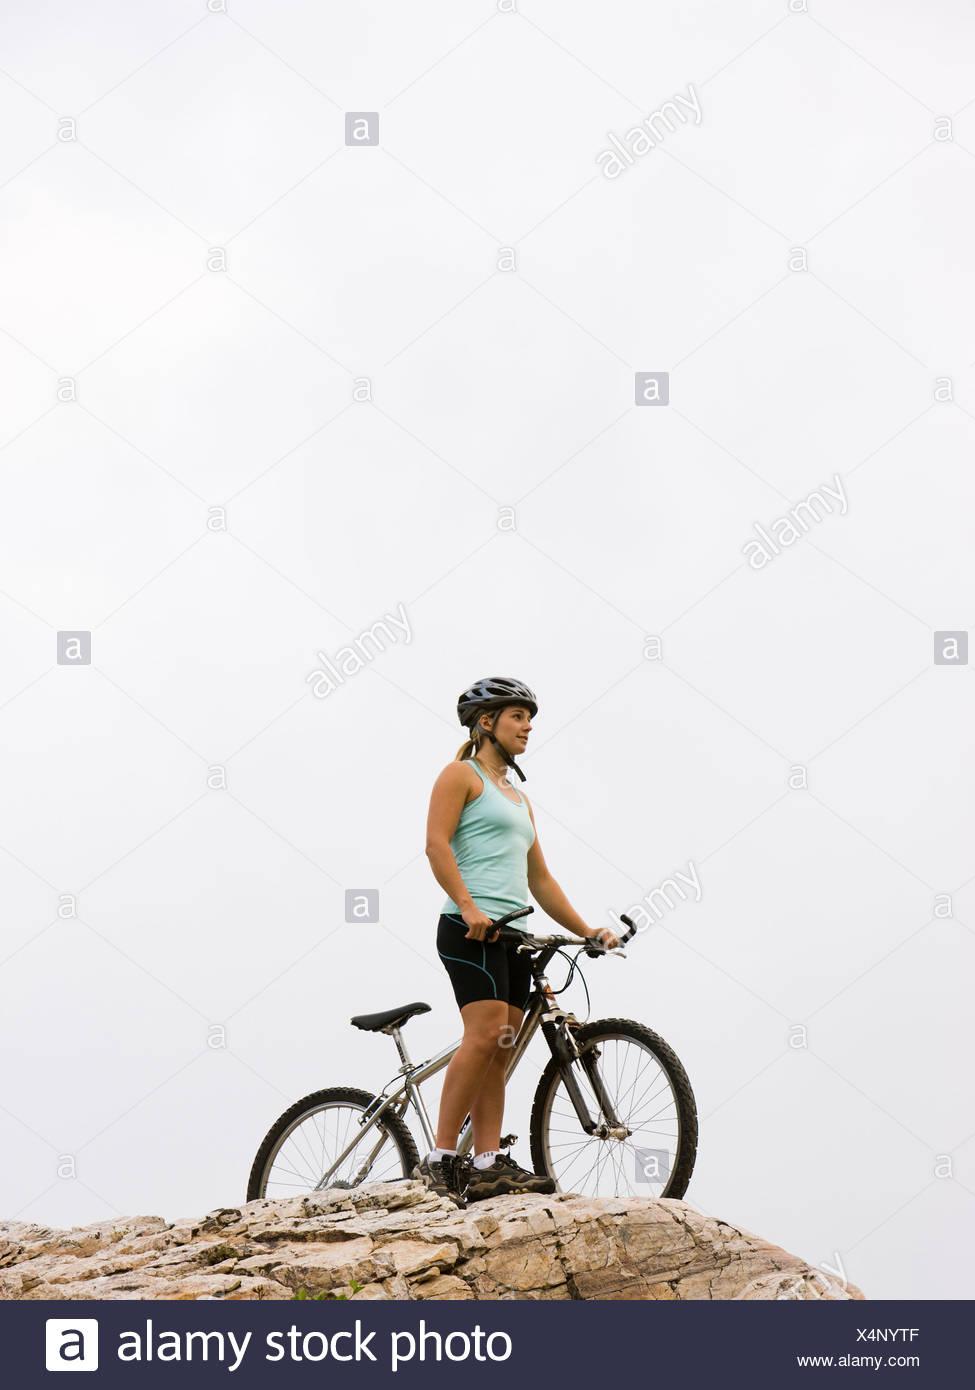 mountain biker on a rocky ridge - Stock Image